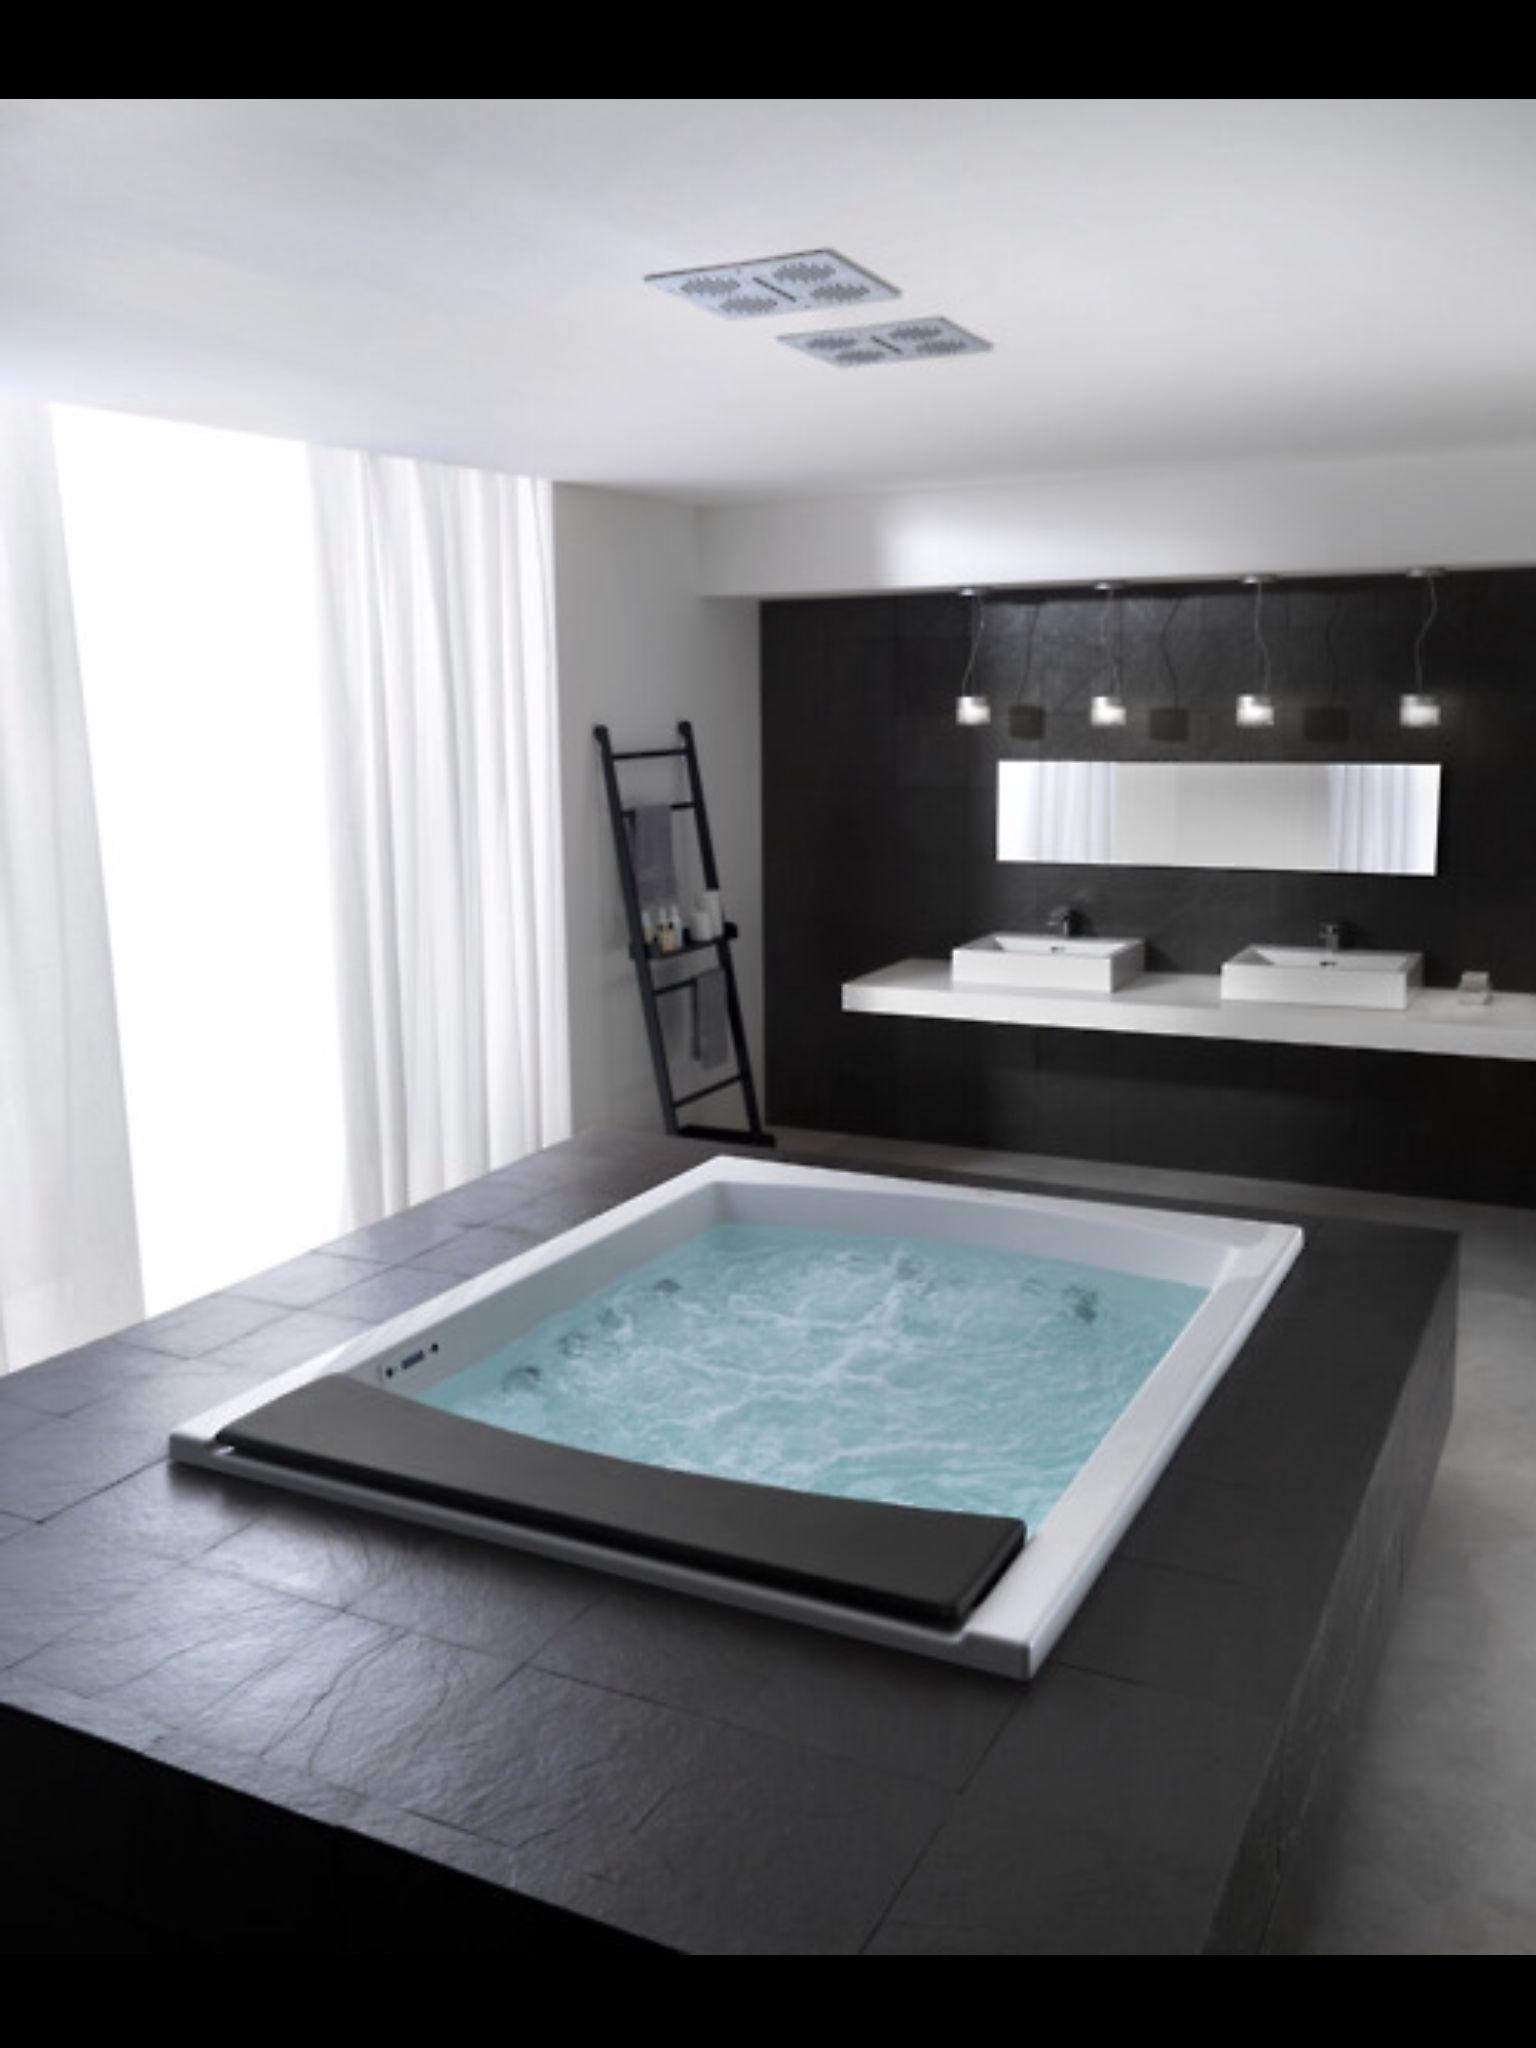 Indoor Hot Tub Dream Bathrooms Home Dream House